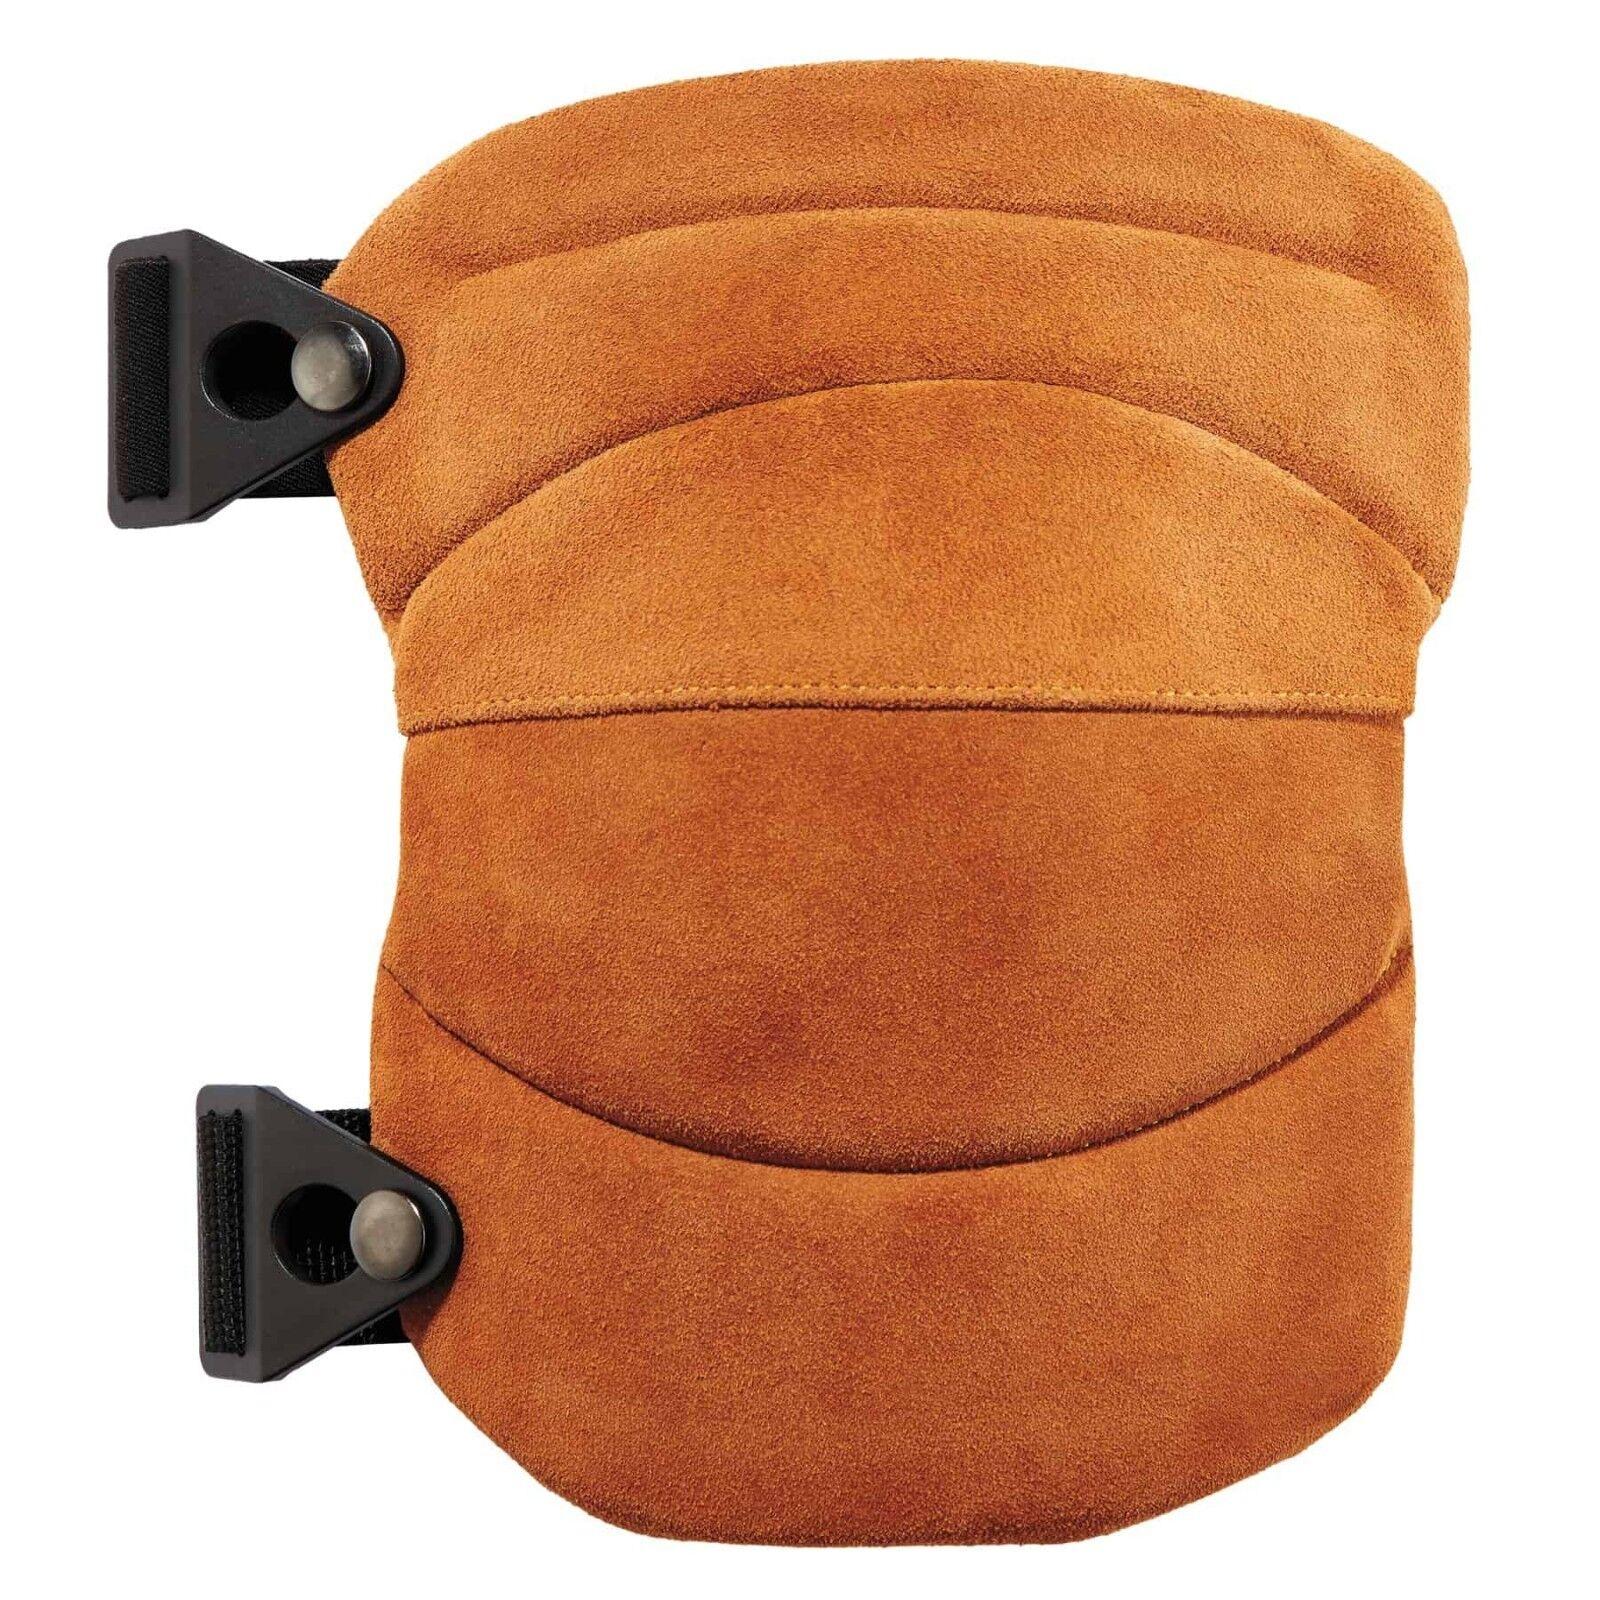 Ergodyne ProFlex 230LTR Leather Knee Pads - Wide Soft Cap, 18232, FREE SHIPPING